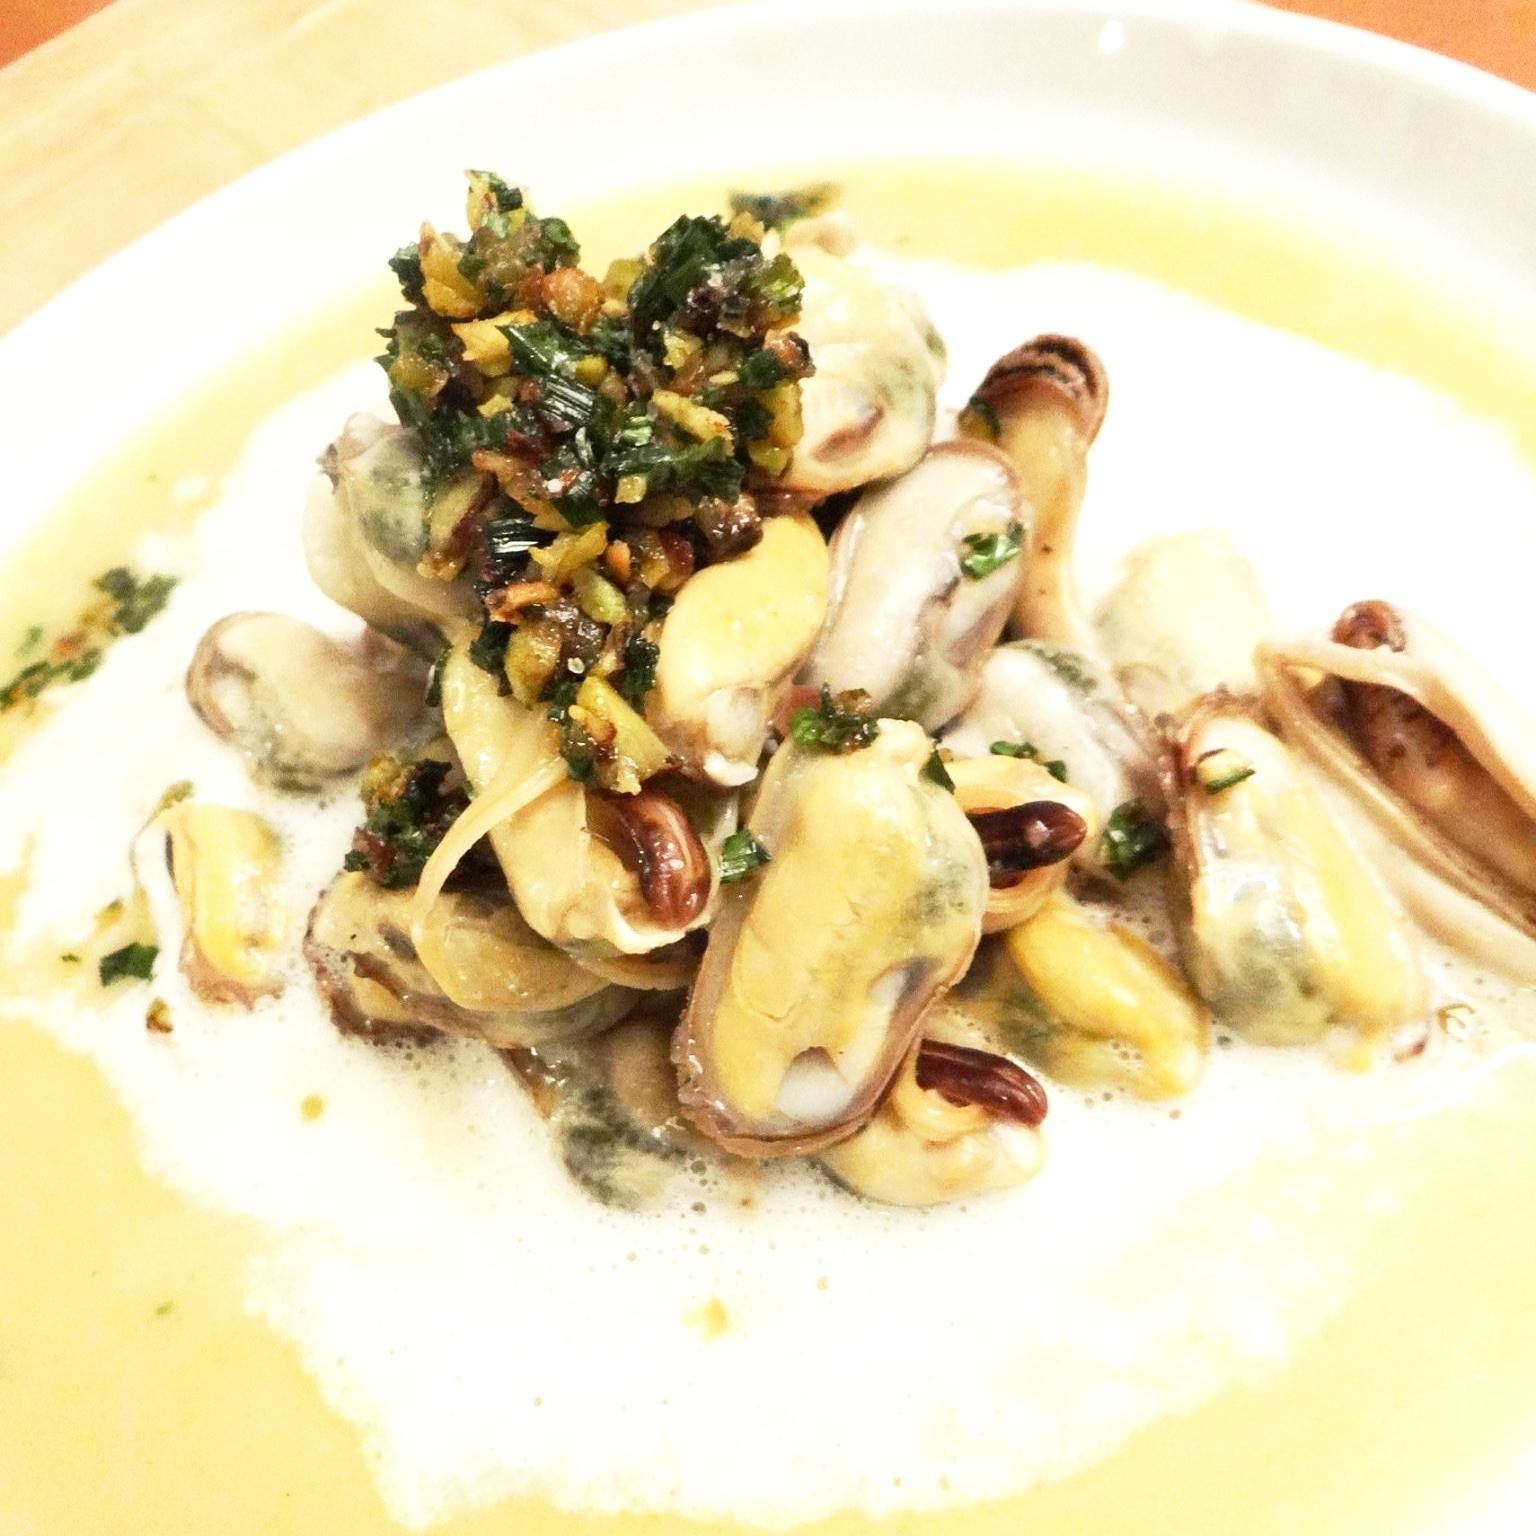 Mussel sauté with apple cyder cream